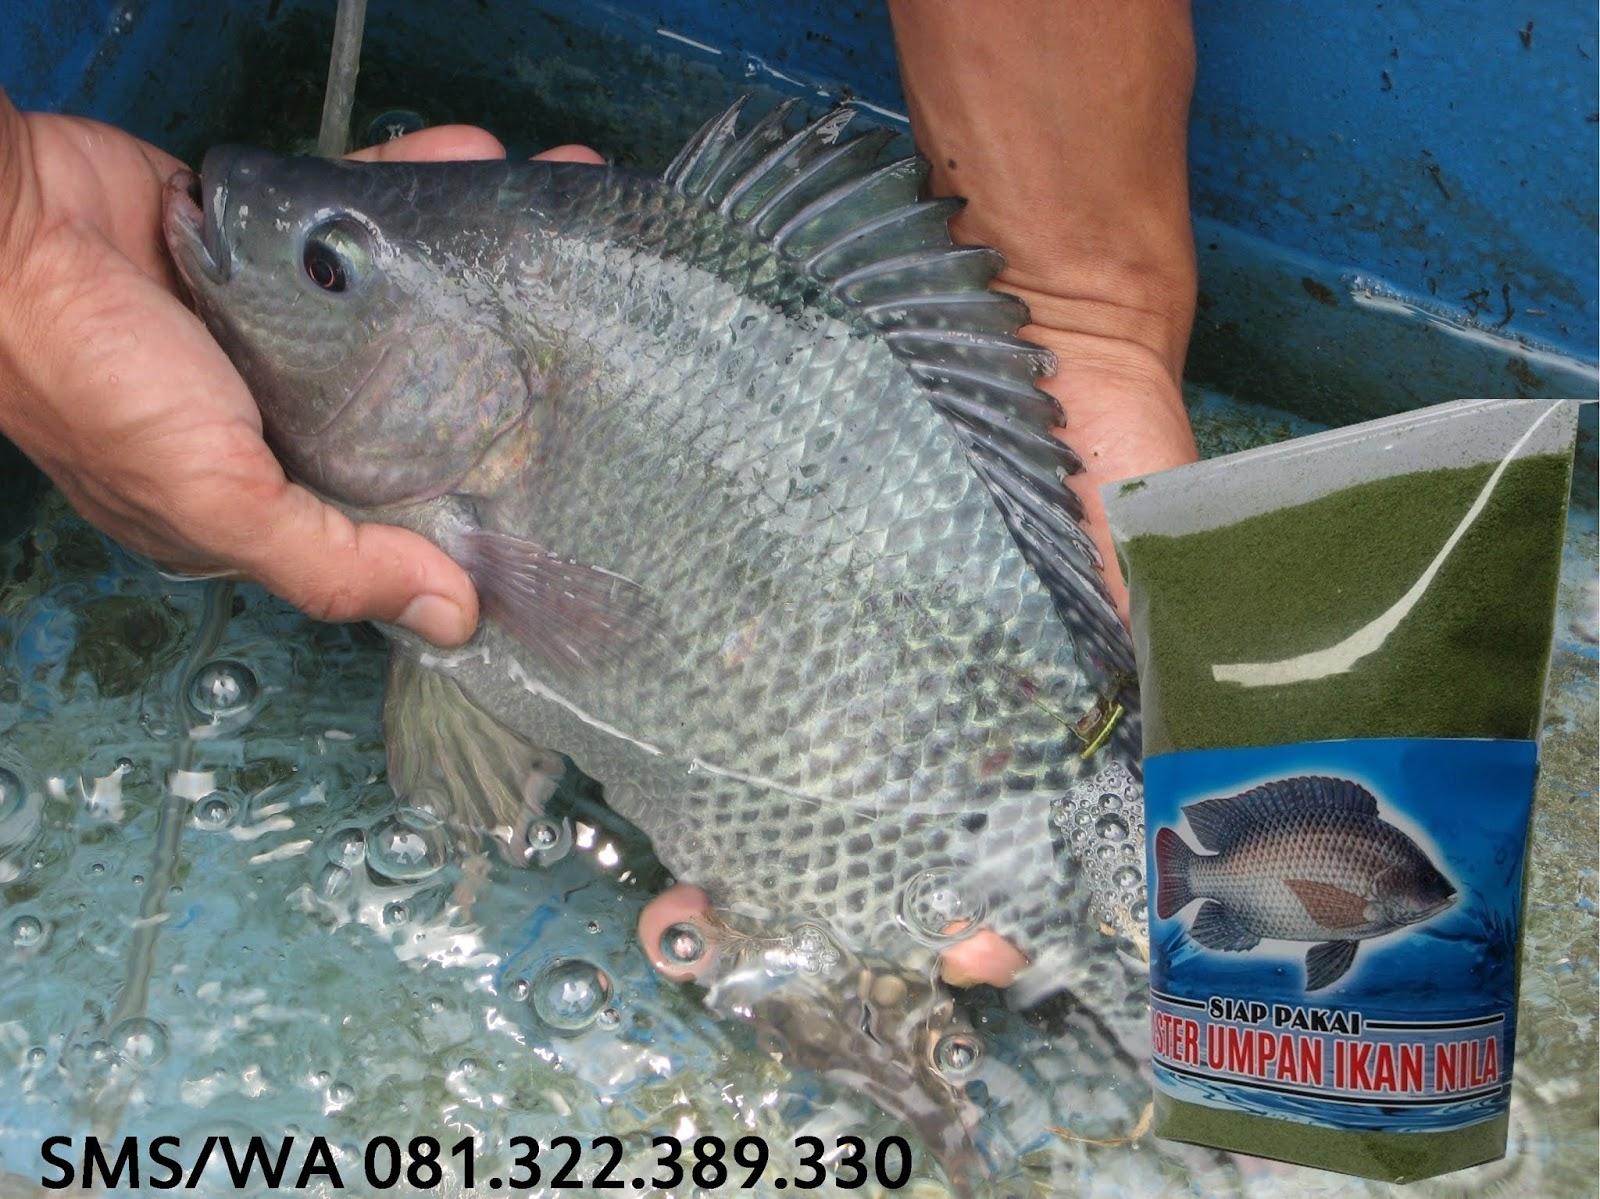 Toko Umpan Master Essen 100 Asli Original Umpan Pelet Ikan Nila Indukan